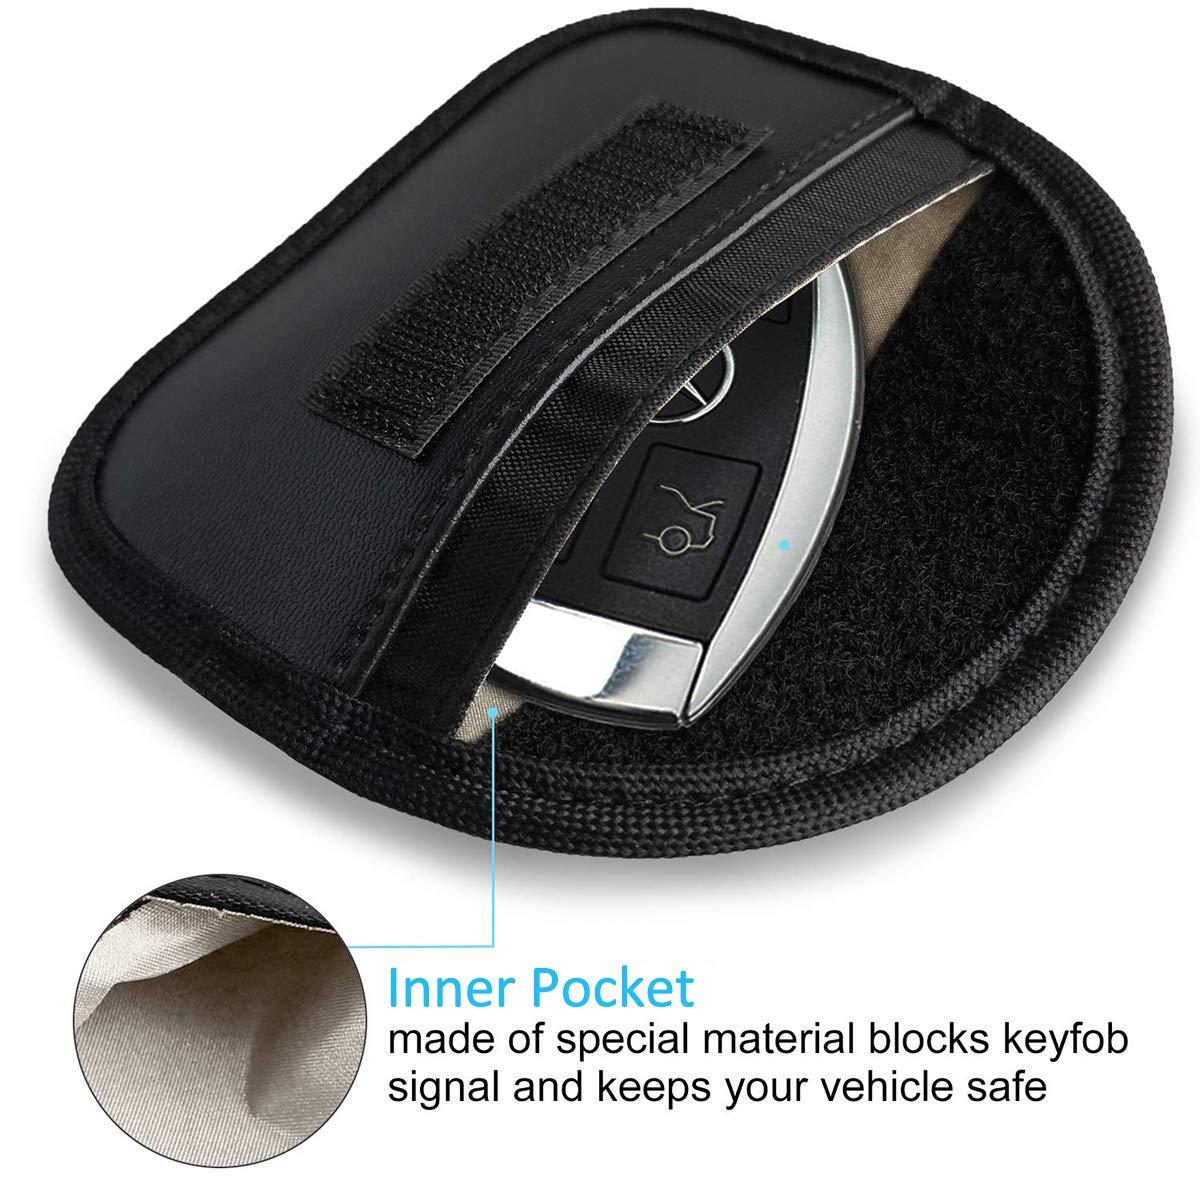 Anti-Theft Pouch Black Premium Faraday Cage Car Key Protector Mini Faraday Bag for Key Fob RFID Signal Blocking Anti-Hacking Case Blocker 2 Pack